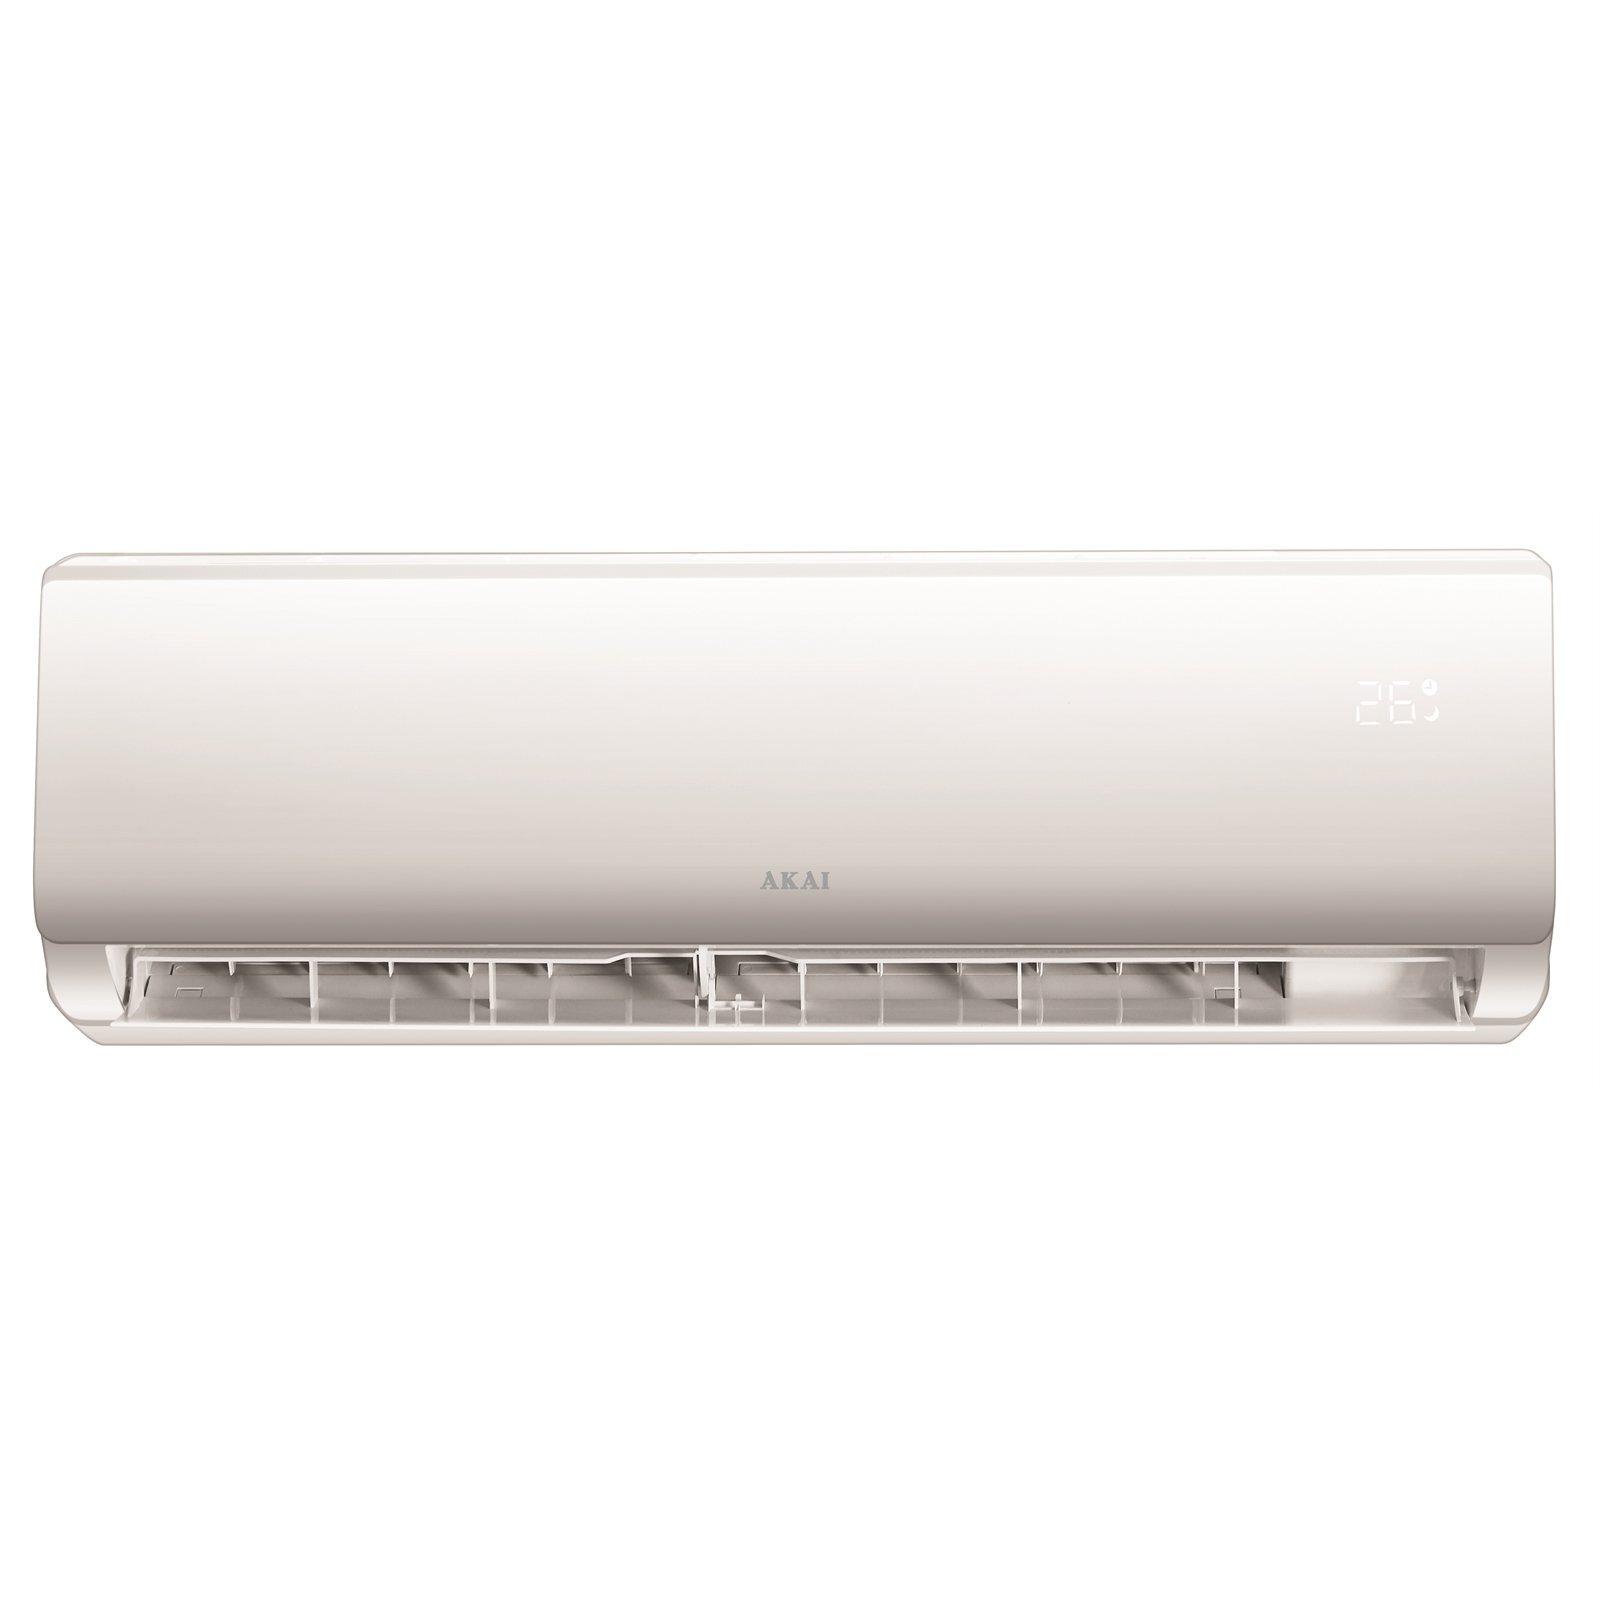 Akai 7.3kW / 8.0kW Reverse Cycle Inverter Split System Air Conditioner